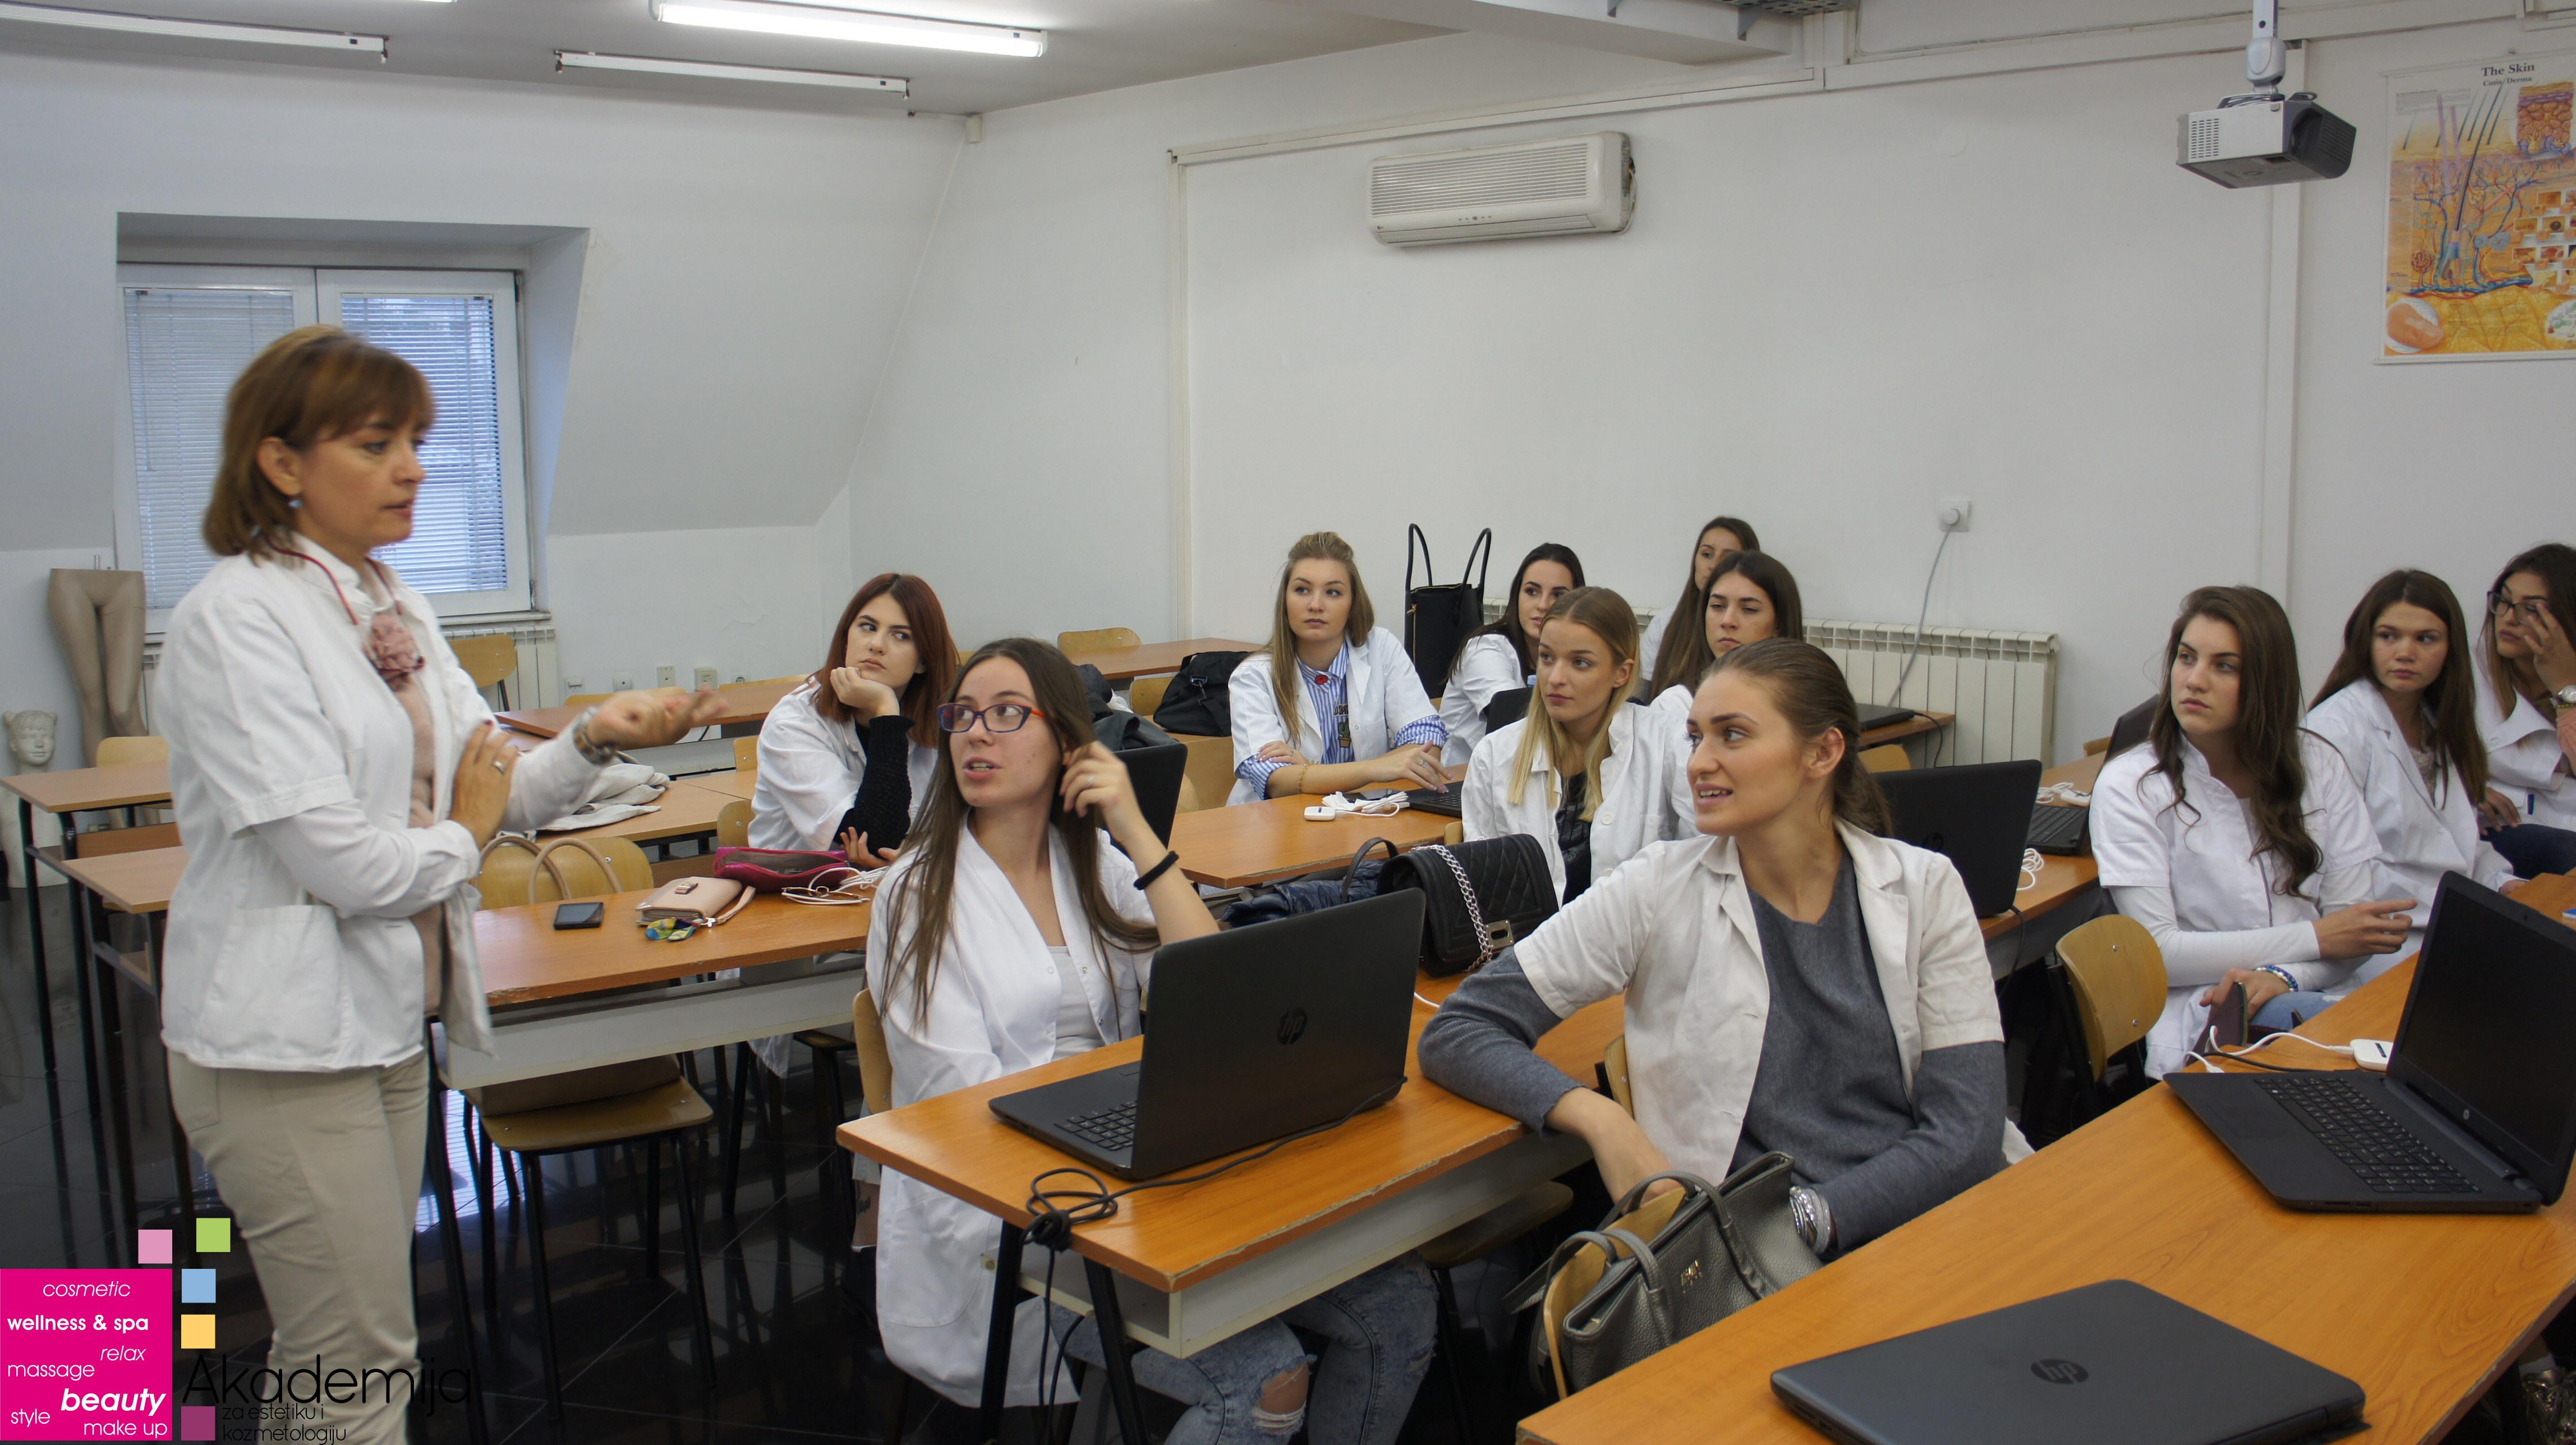 NOVA GENERACIJA ESTETIČARA KOZMETIČARA – Profesor Prim. Dr Svetlana Grubor